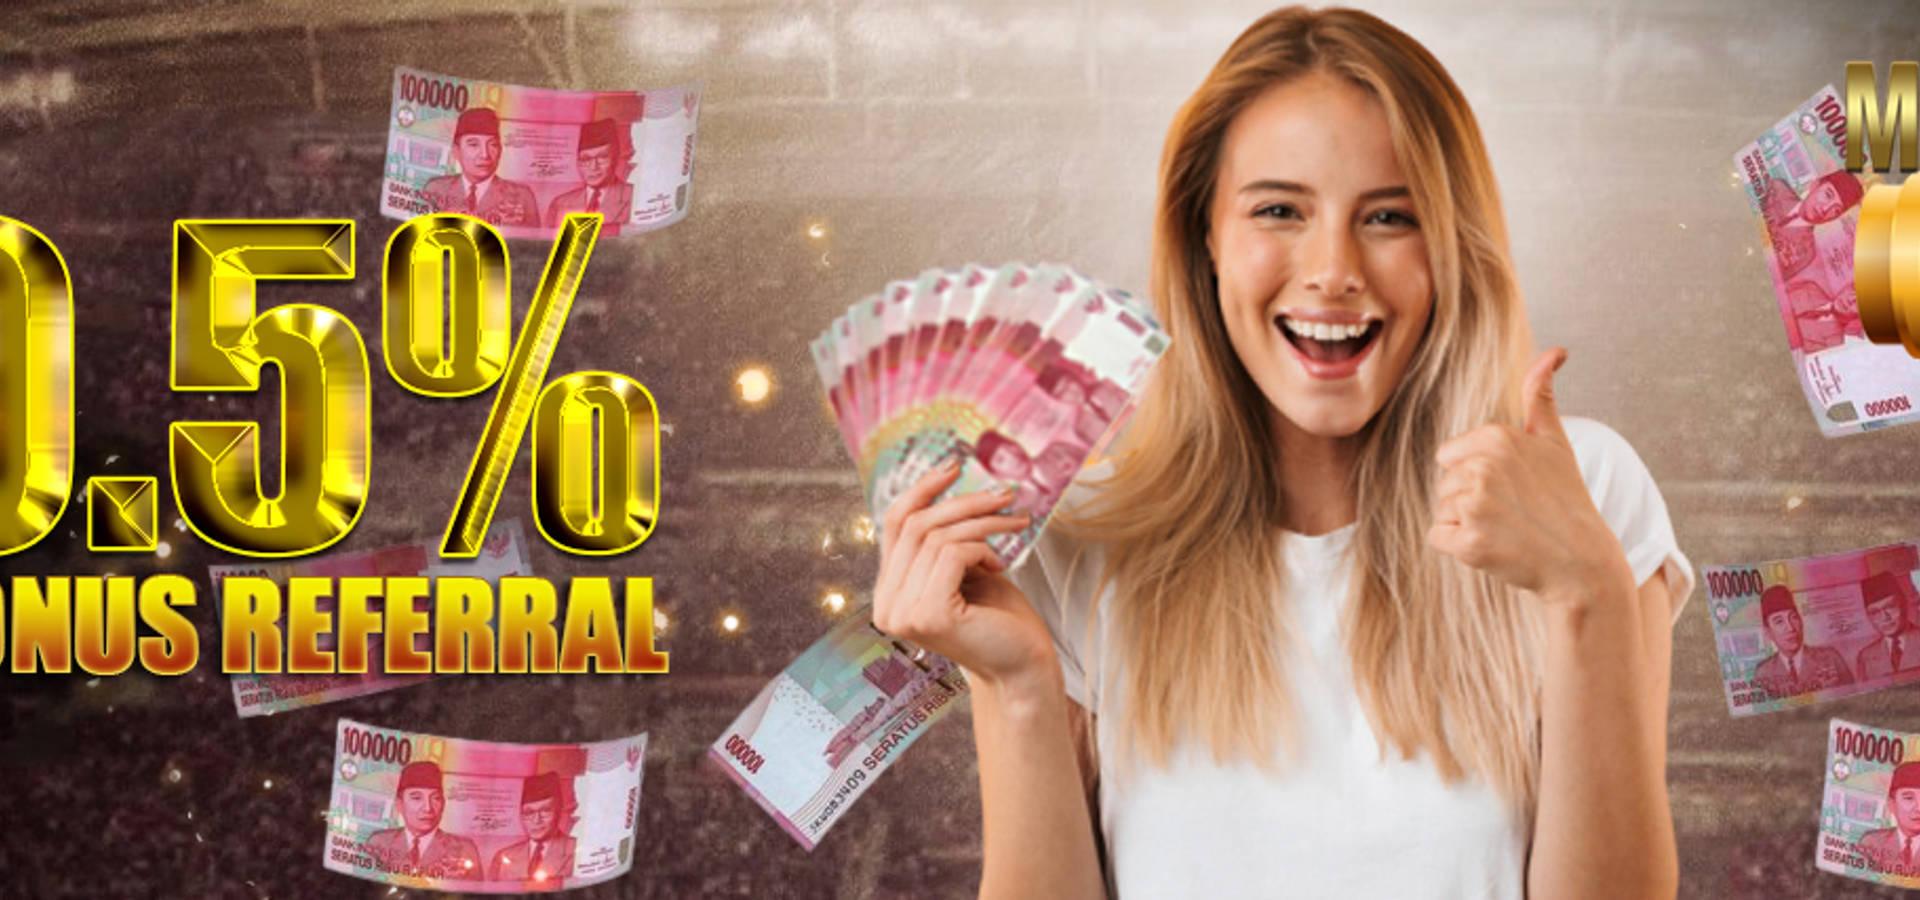 Masterslot88 Situs Judi Slot Online Pulsa XL Telkomsel